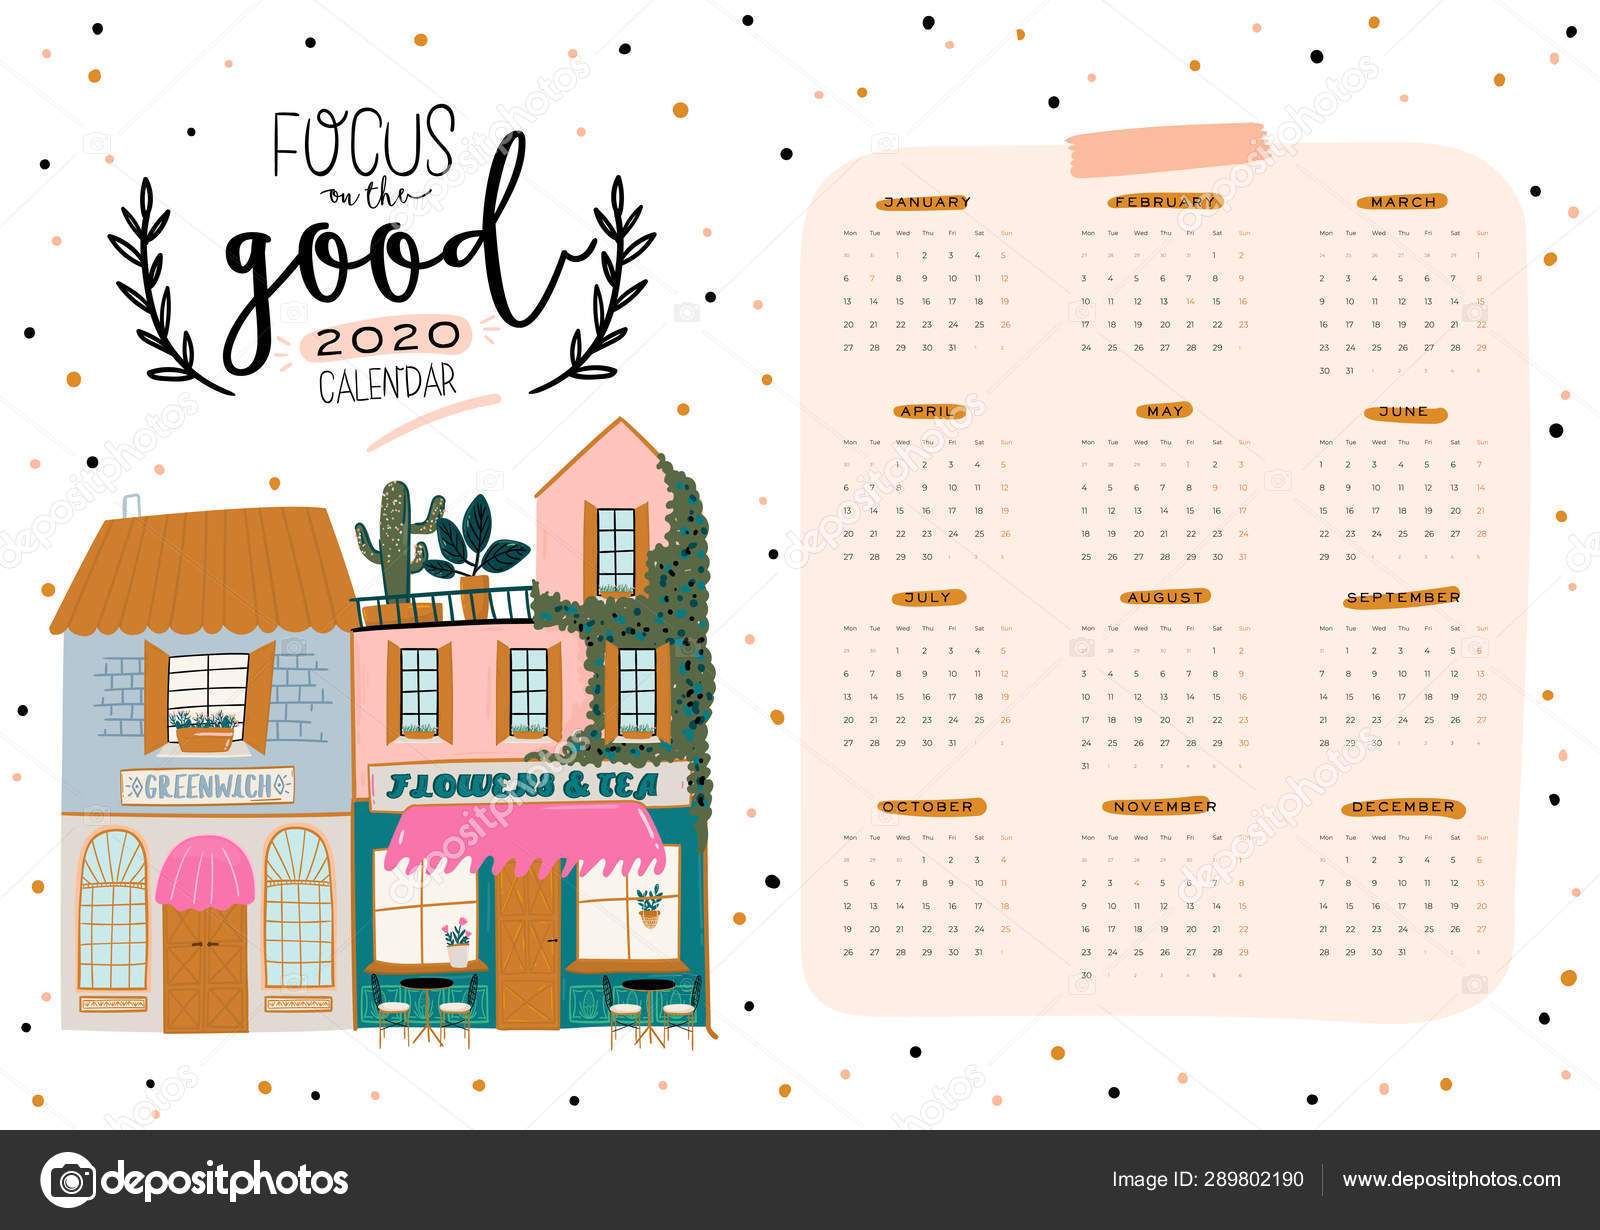 Calendario 2020 Planner.Wall Calendar 2020 Yearly Planner All Months Good Organizer